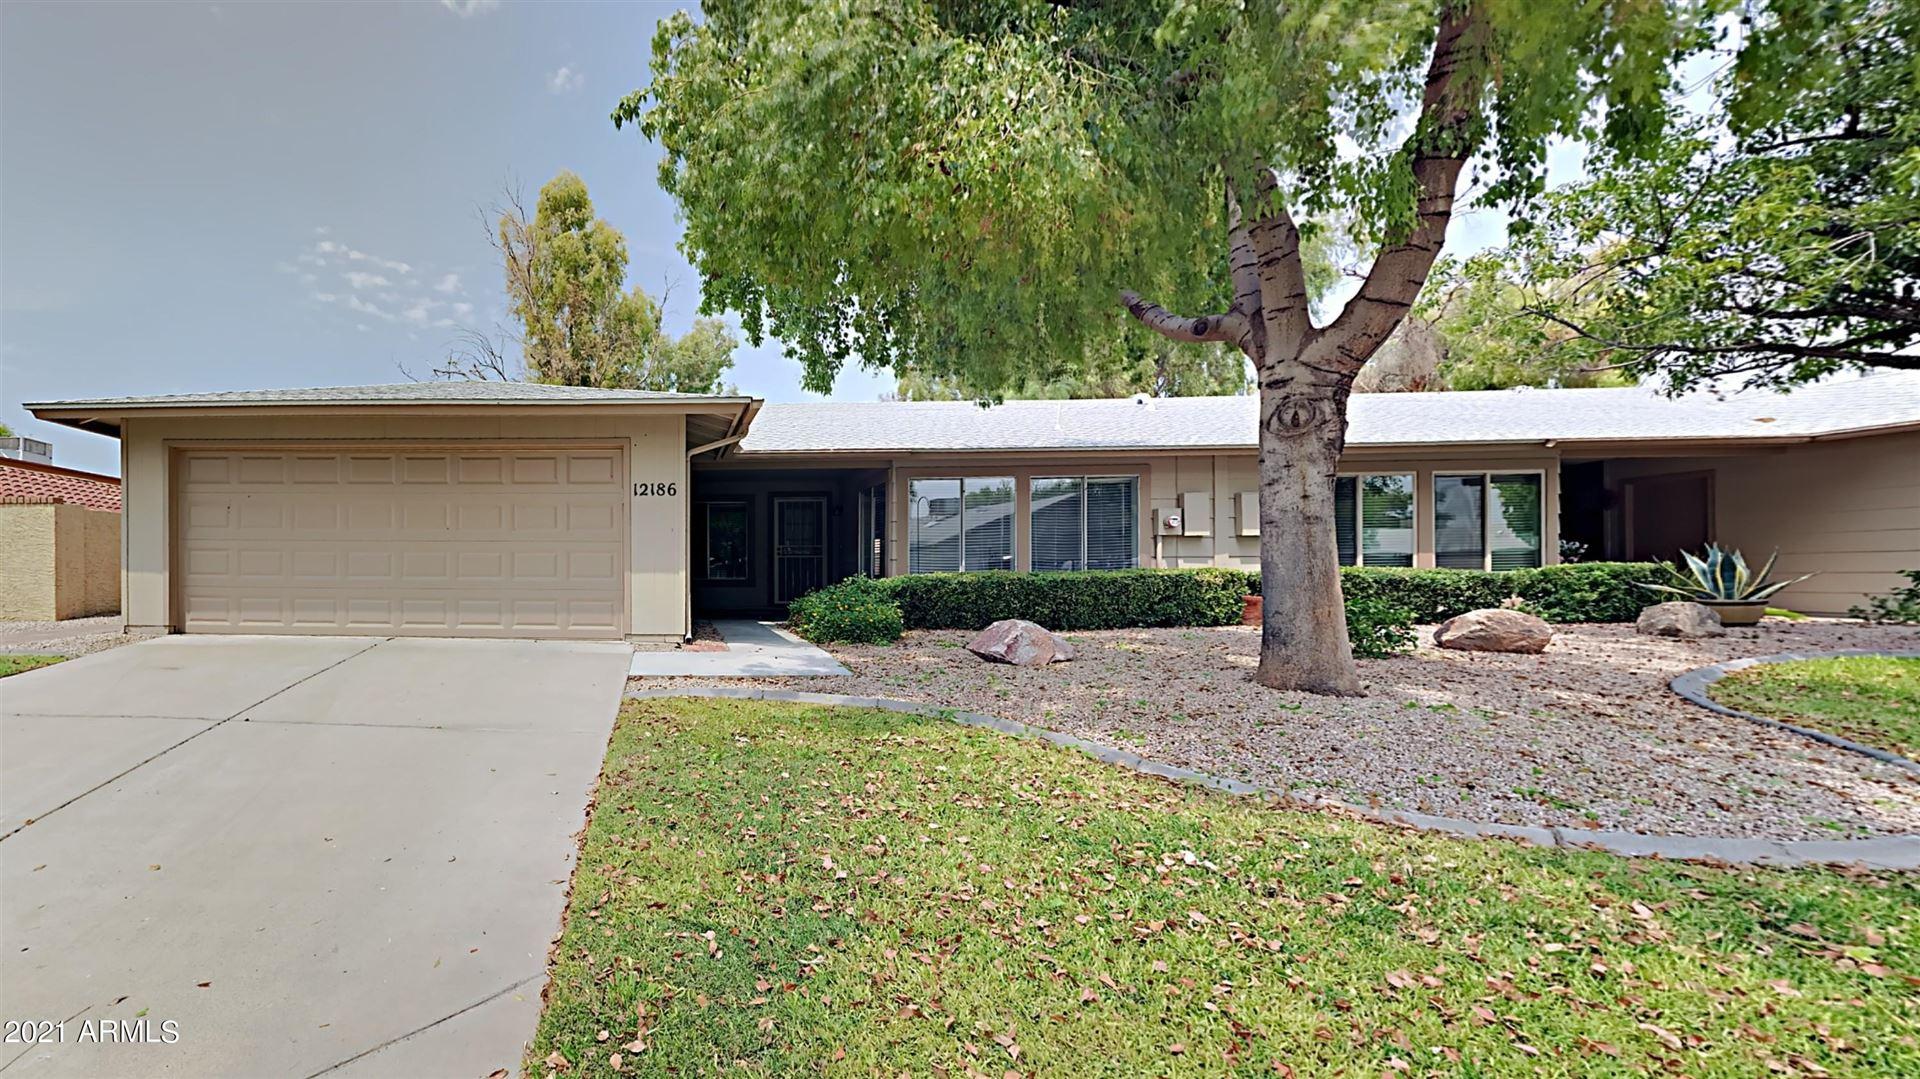 Photo of 12186 S Shoshoni Drive, Ahwatukee, AZ 85044 (MLS # 6271552)